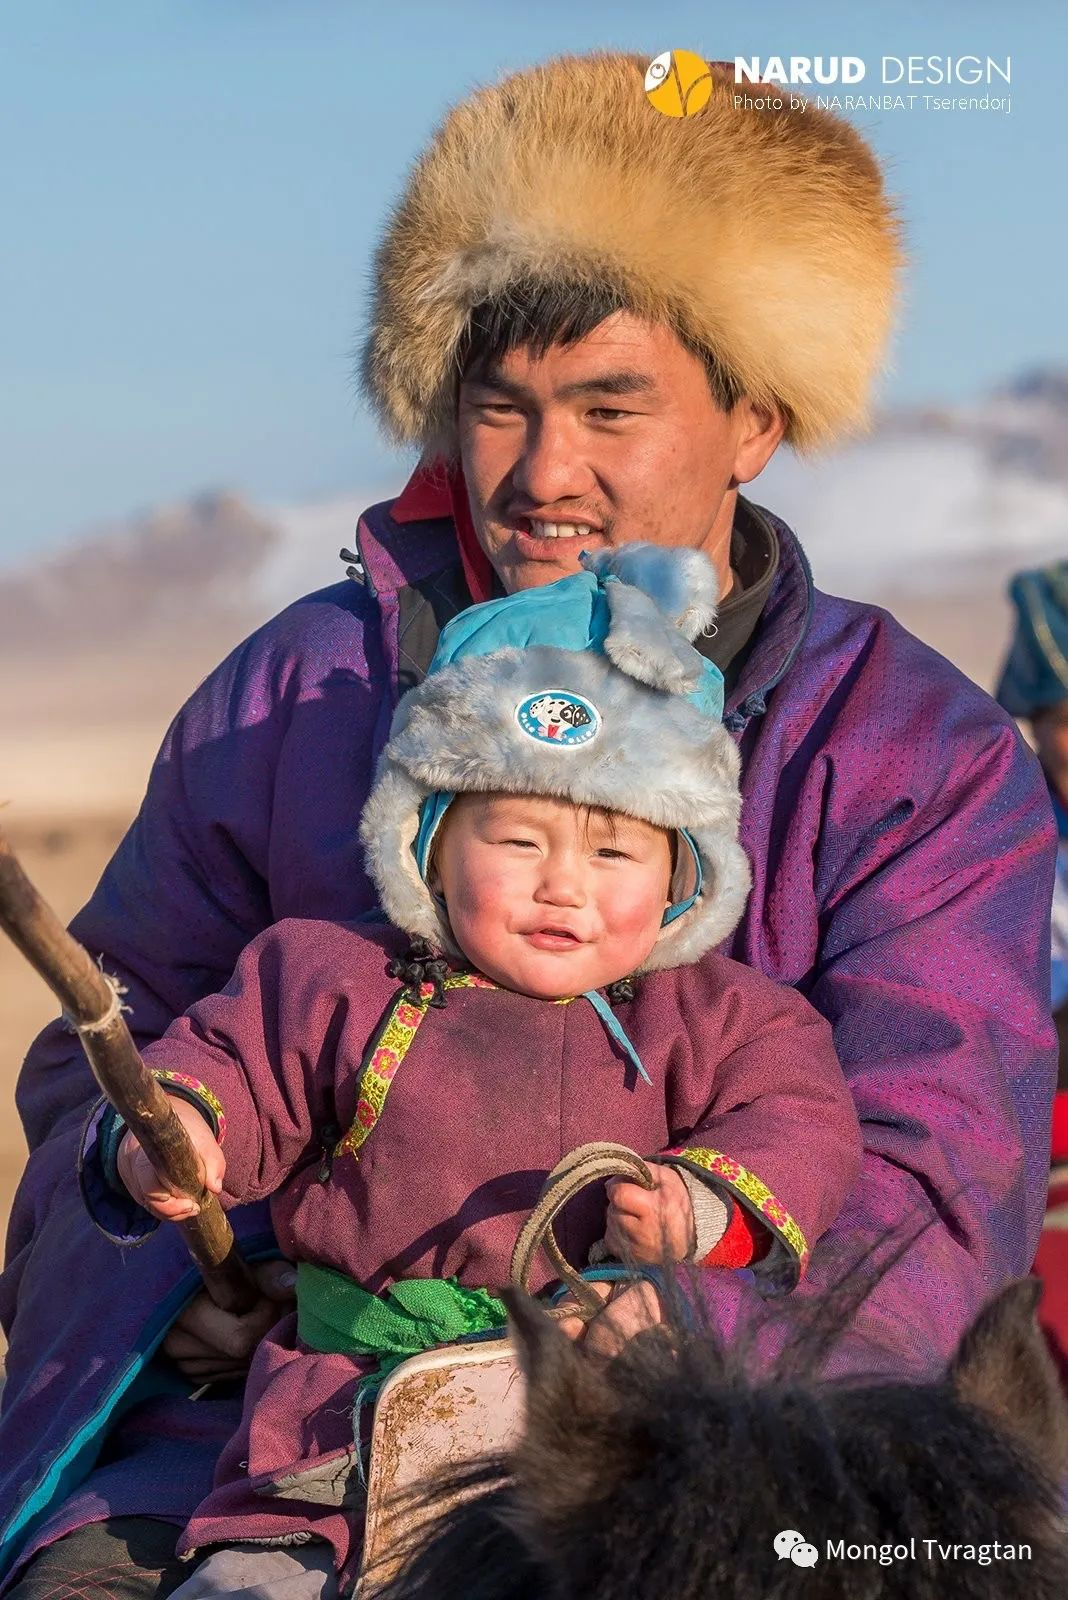 ᠮᠣᠩᠭᠤᠯ ᠰᠡᠭᠦᠳᠡᠷ- ᠴ᠂ ᠨᠠᠷᠠᠨᠪᠠᠲᠤ 第9张 ᠮᠣᠩᠭᠤᠯ ᠰᠡᠭᠦᠳᠡᠷ- ᠴ᠂ ᠨᠠᠷᠠᠨᠪᠠᠲᠤ 蒙古文化